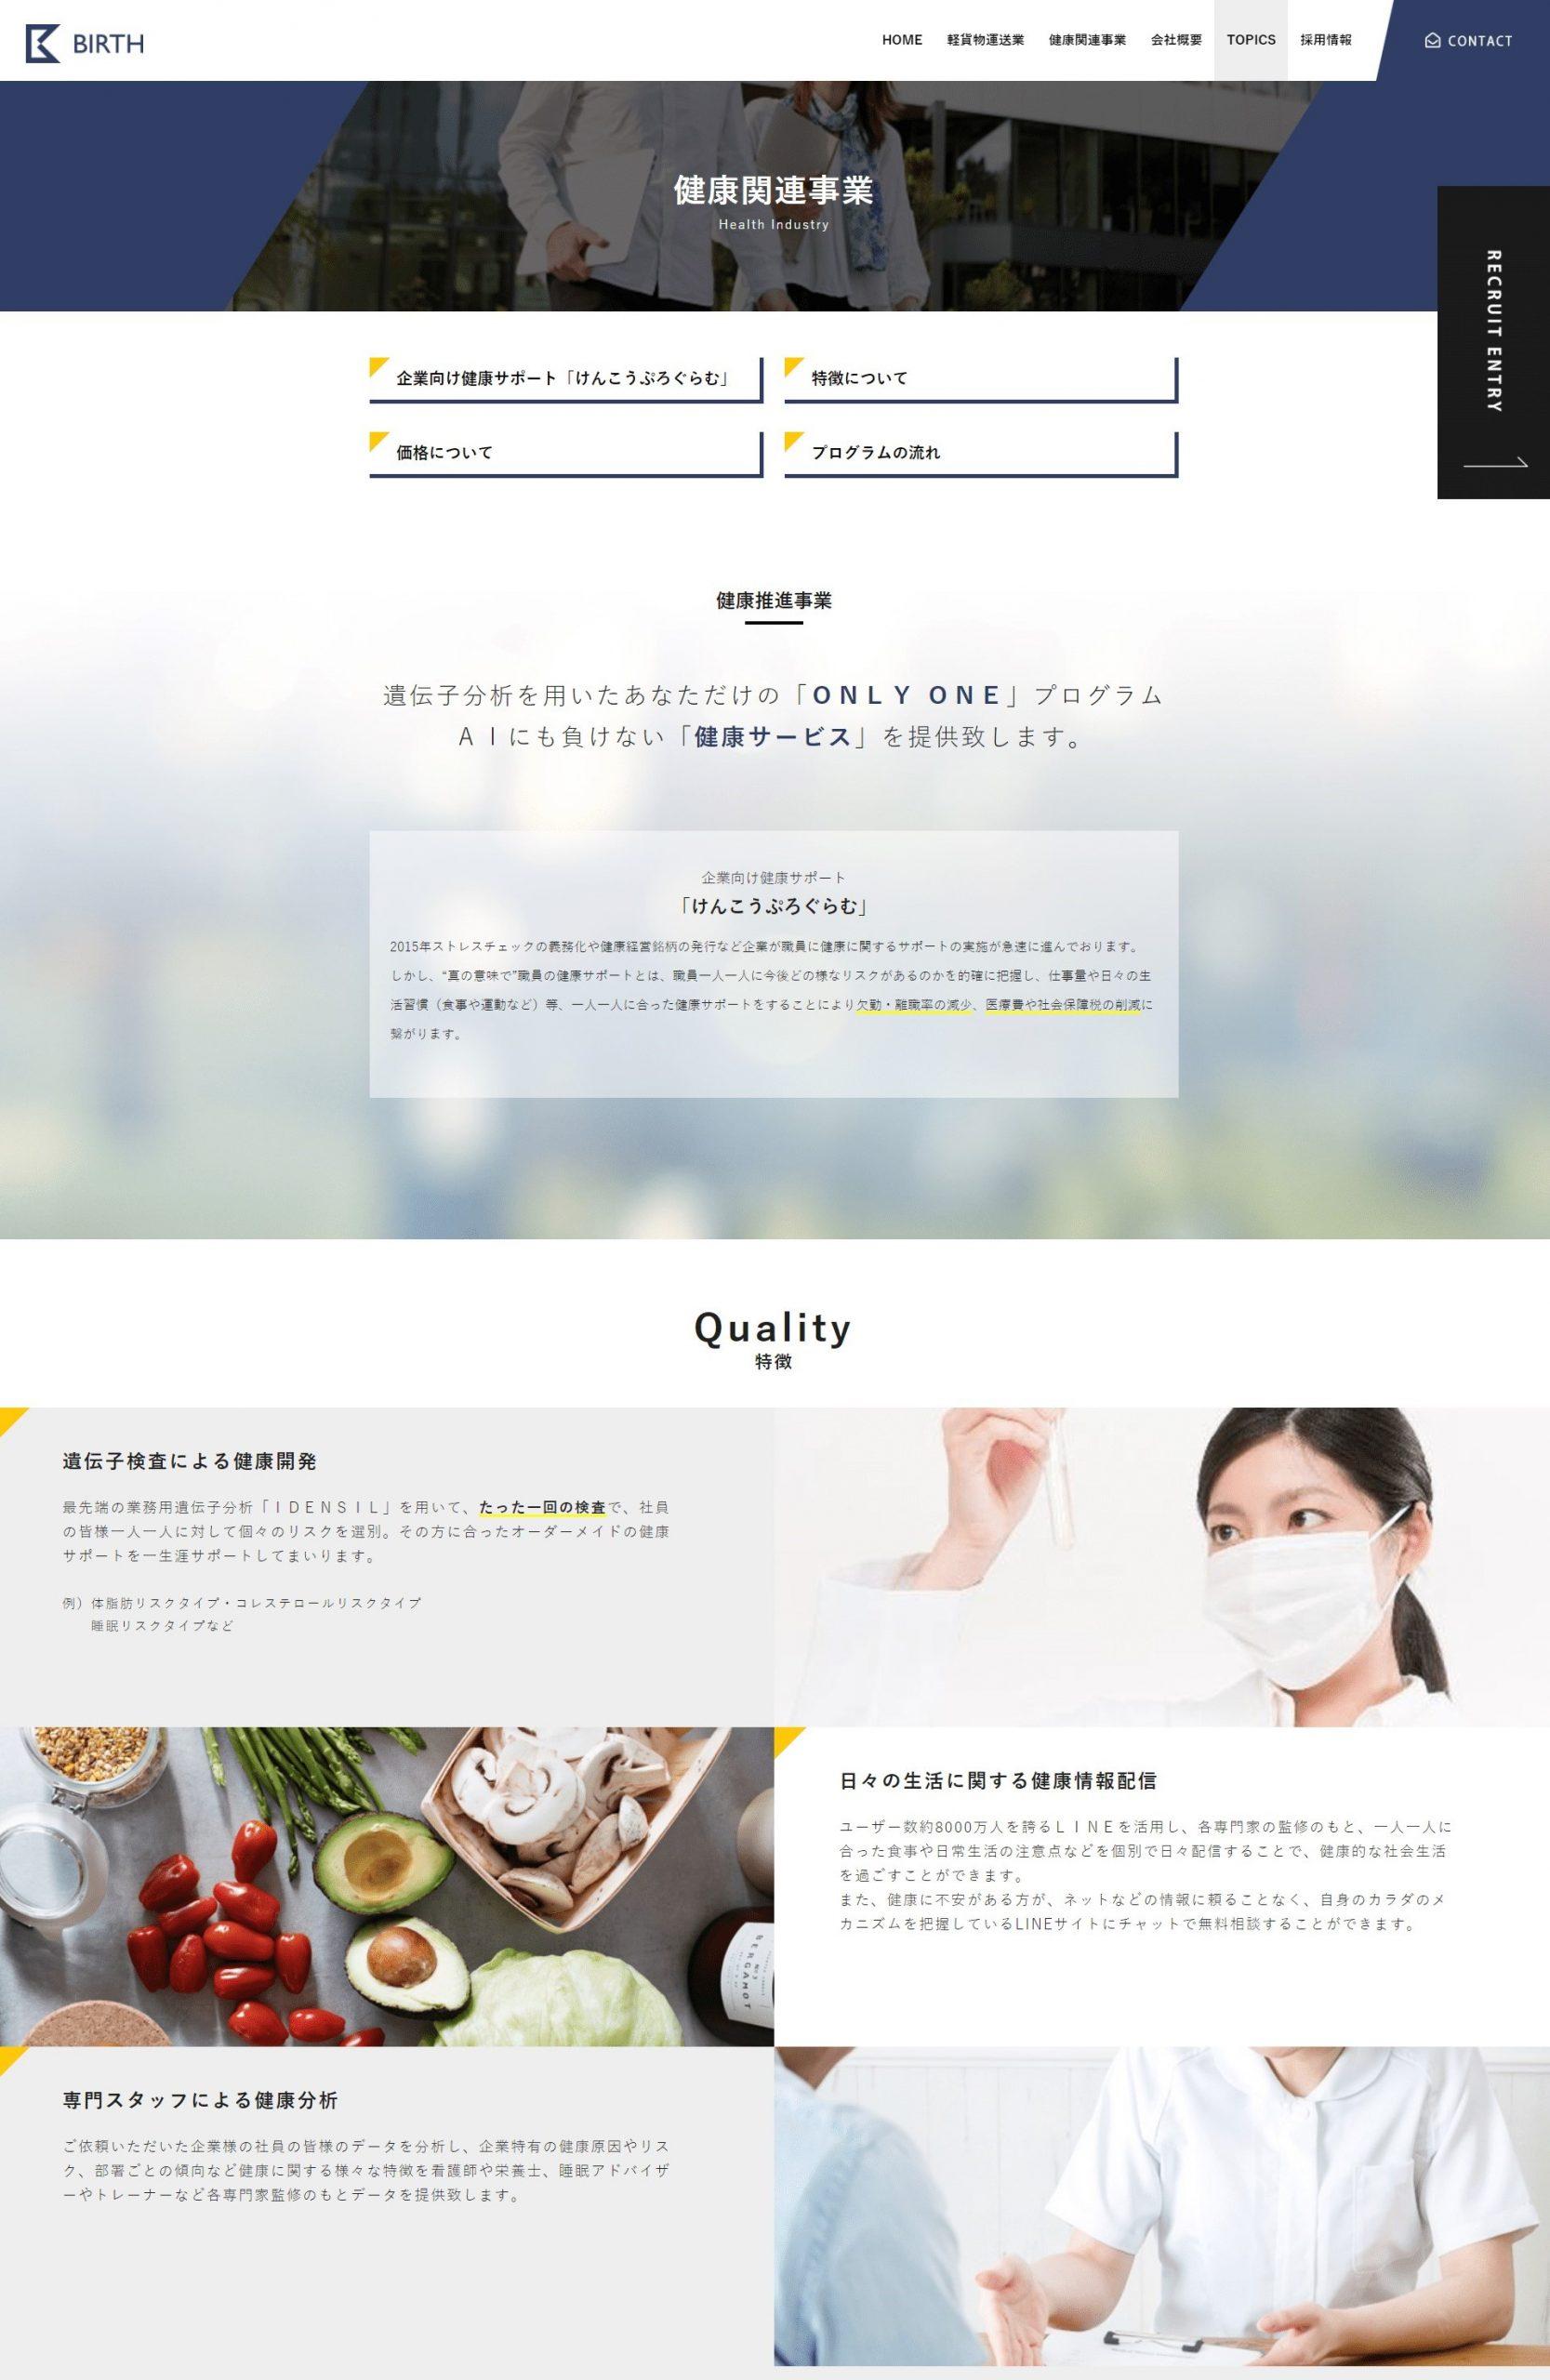 FireShot Capture 139 - 健康関連事業 – BIRTH - birth.work-min (2)